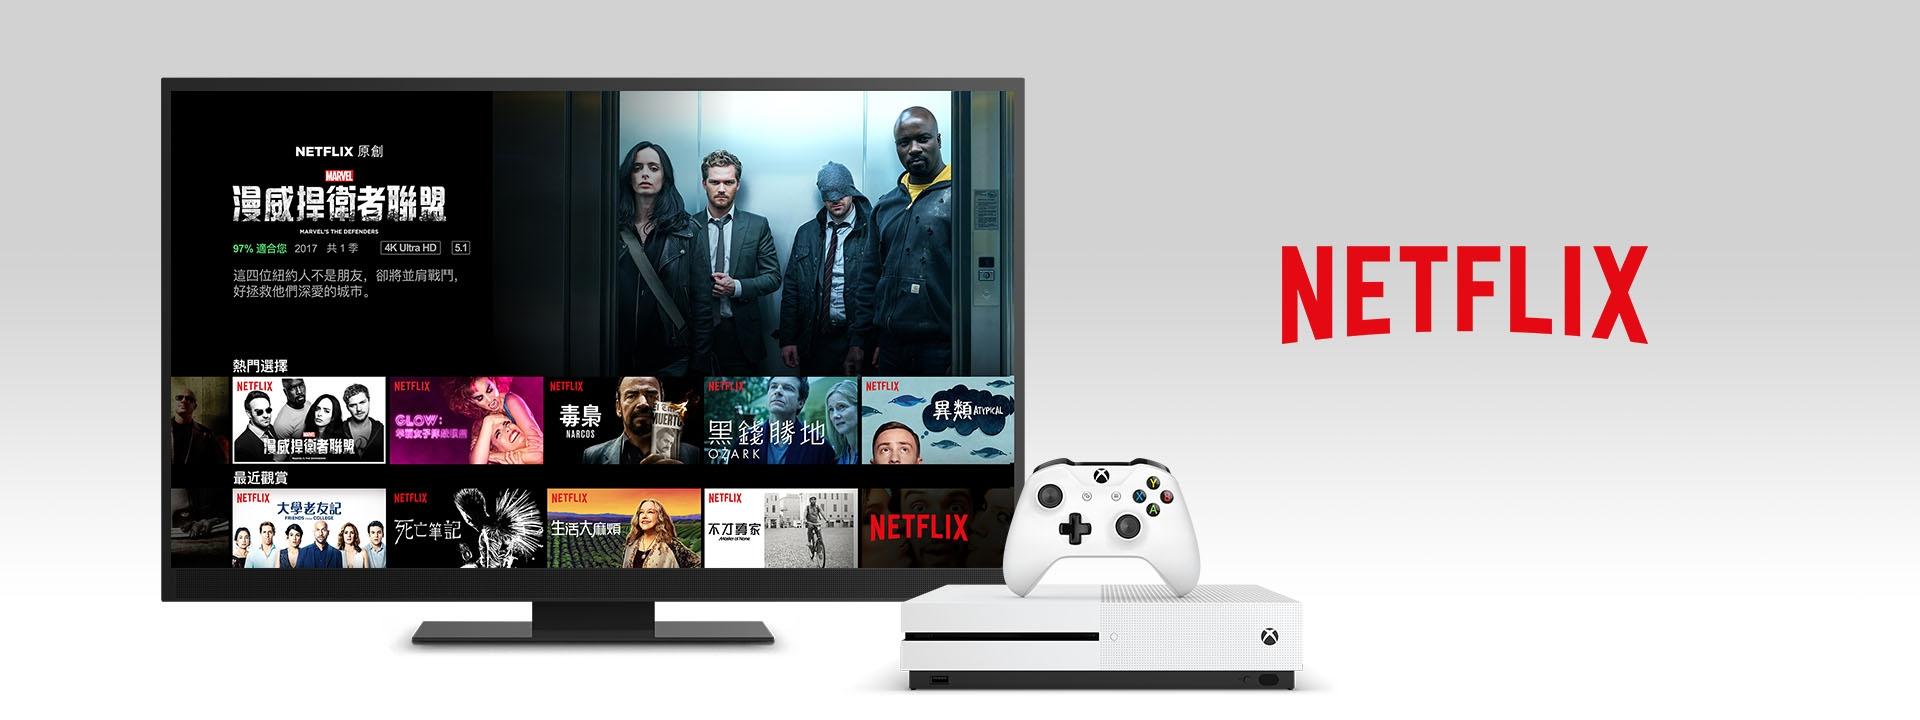 Netflix 登陸 Xbox One